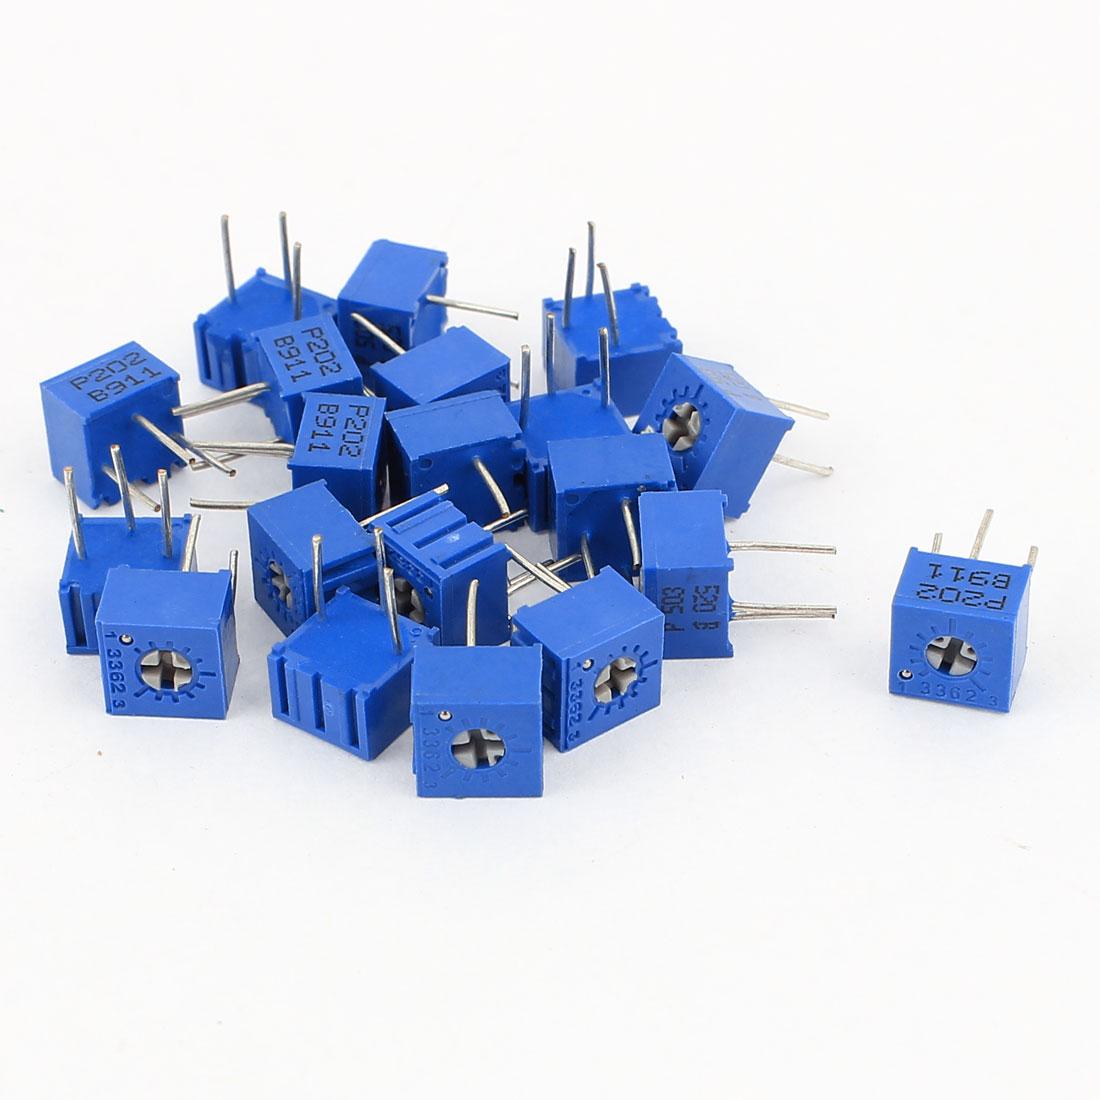 20Pcs Potentiometer Trimmer Variable Resistor 3362P-202 3362P-503